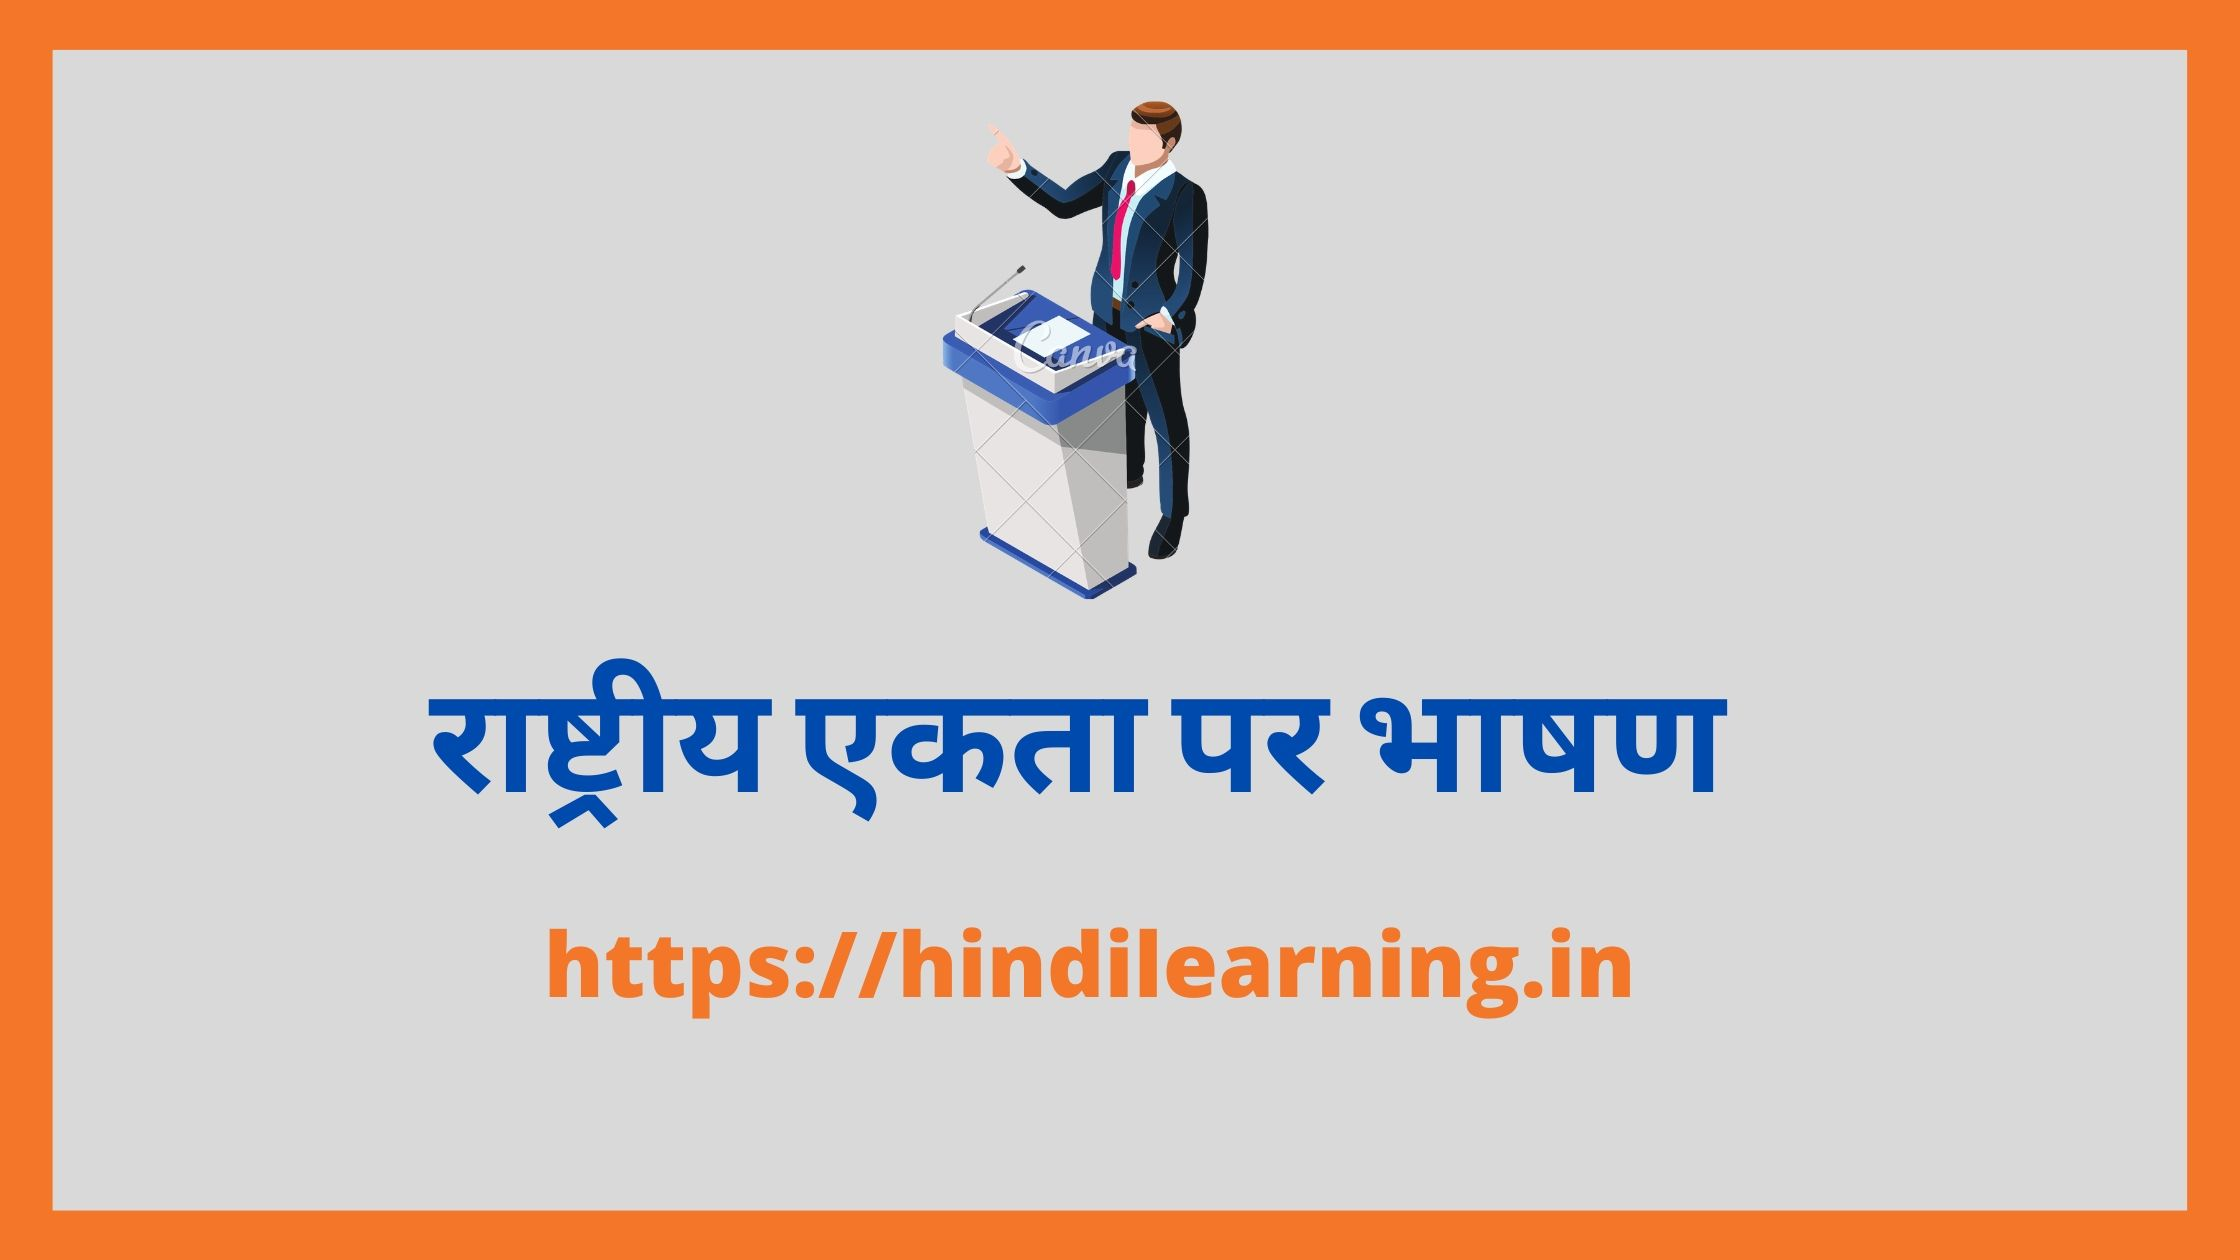 राष्ट्रीय एकता पर भाषण - Speech on National Integration in Hindi